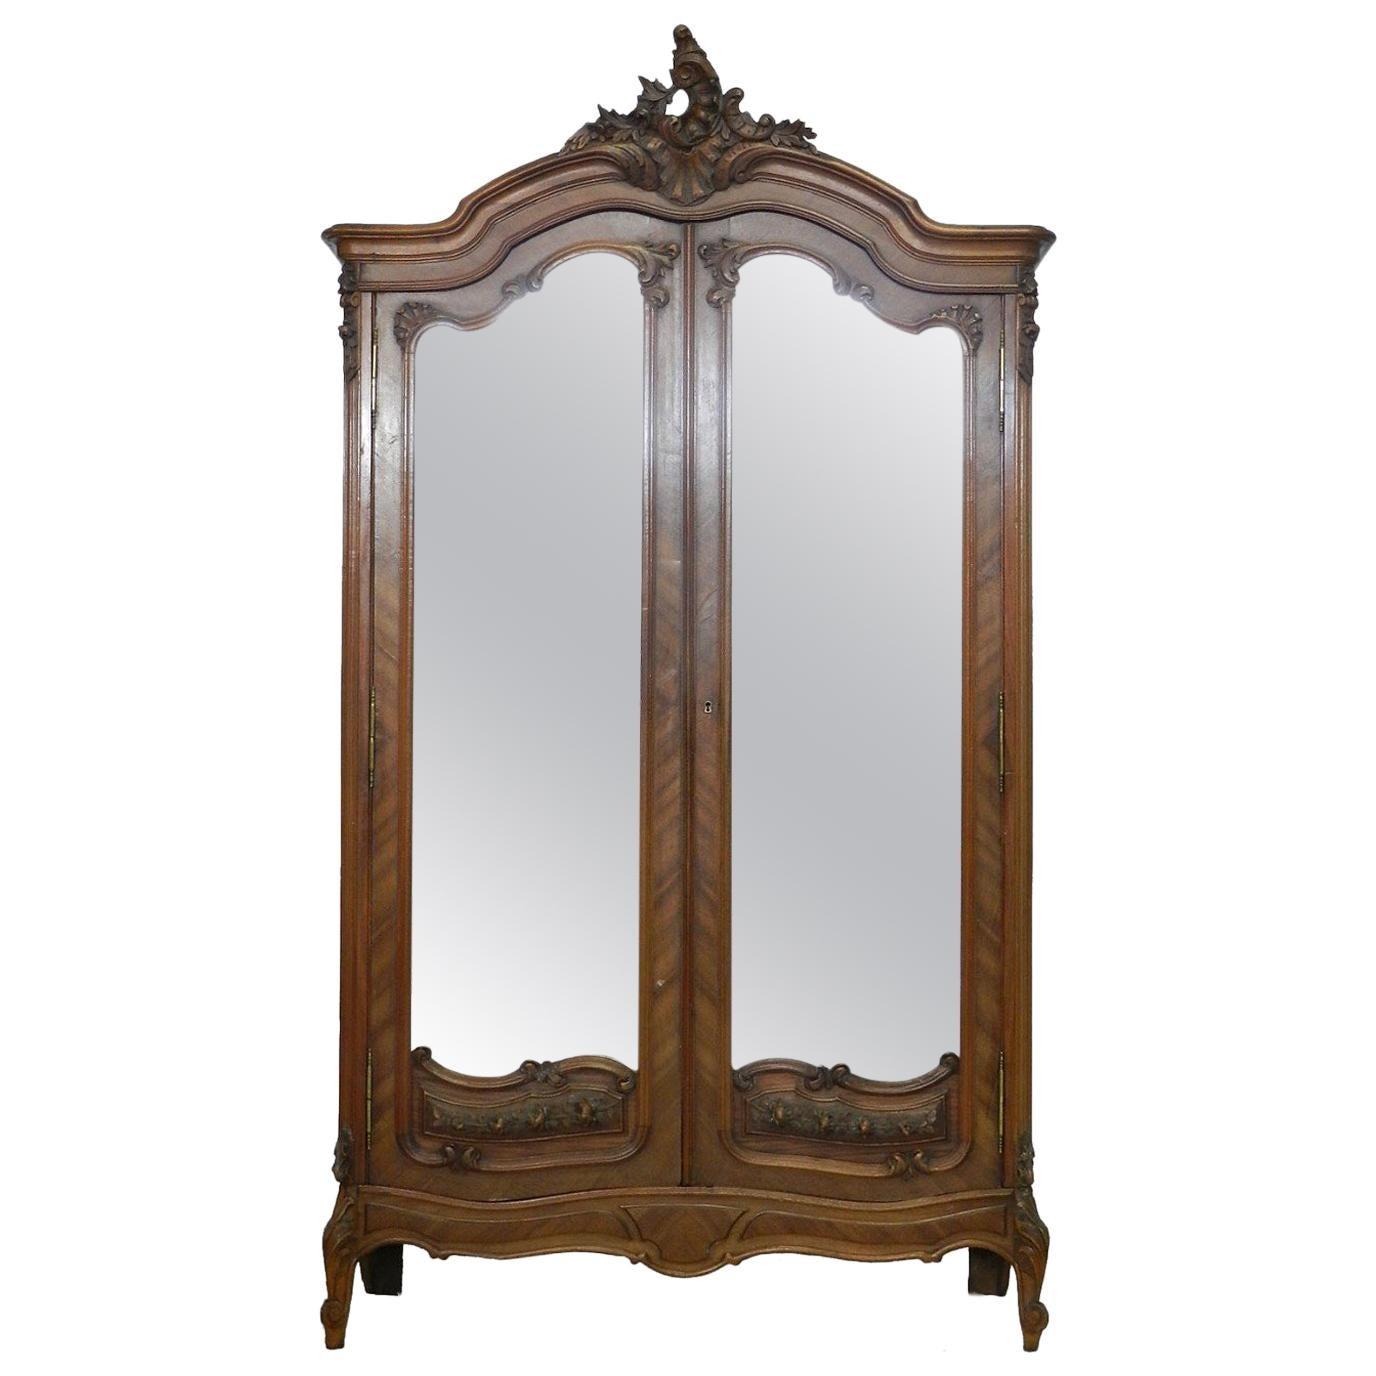 Antique French Louis Xv Armoire Wardrobe Walnut Triple Beveled Mirrors Shelves Furniture